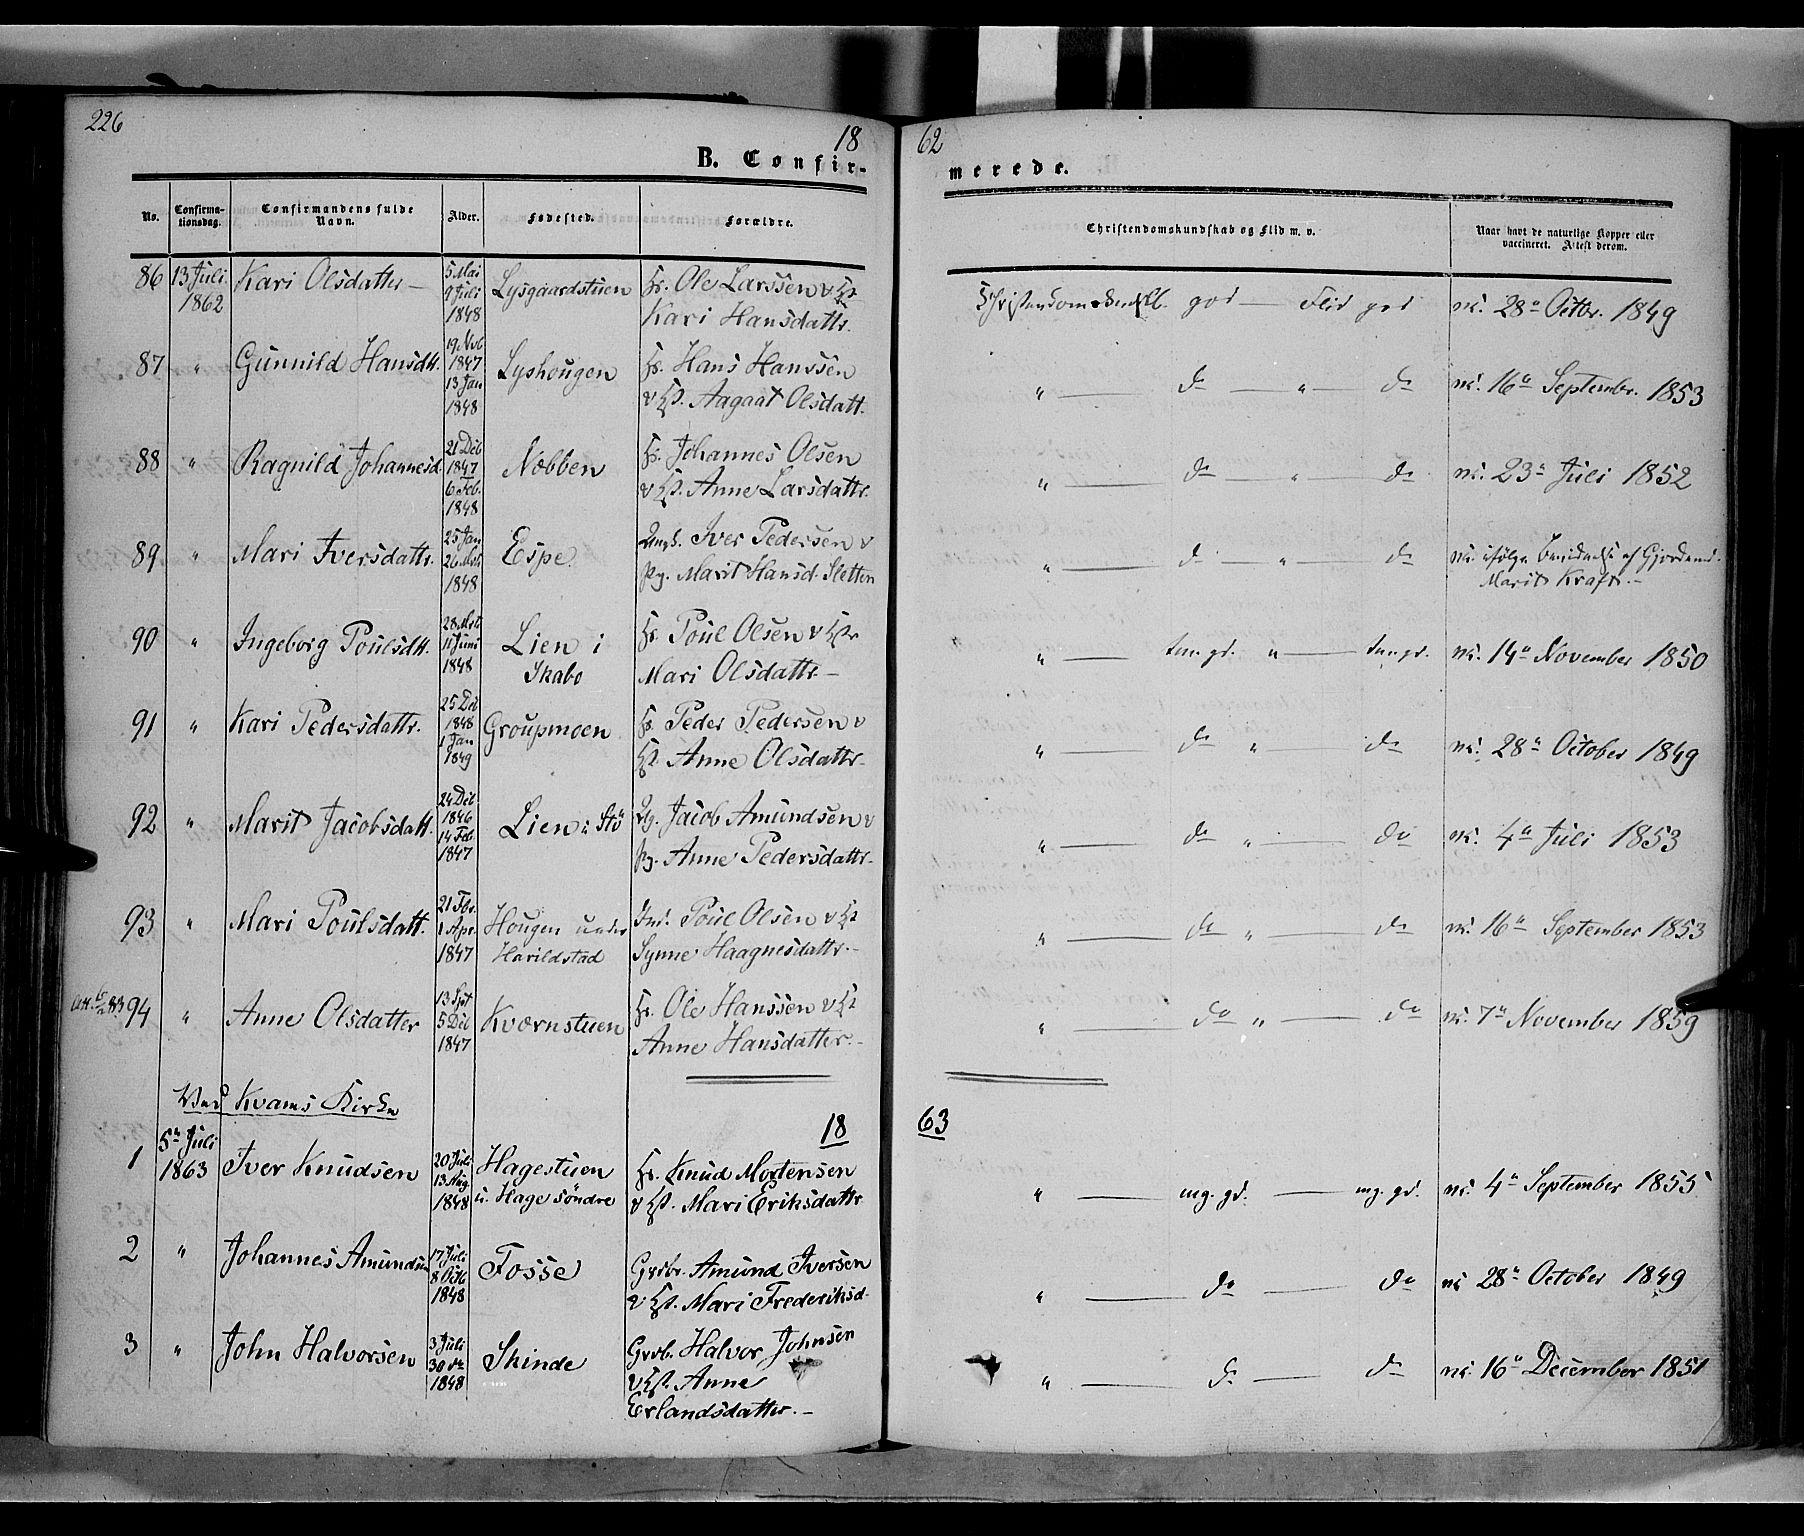 SAH, Nord-Fron prestekontor, Ministerialbok nr. 1, 1851-1864, s. 226